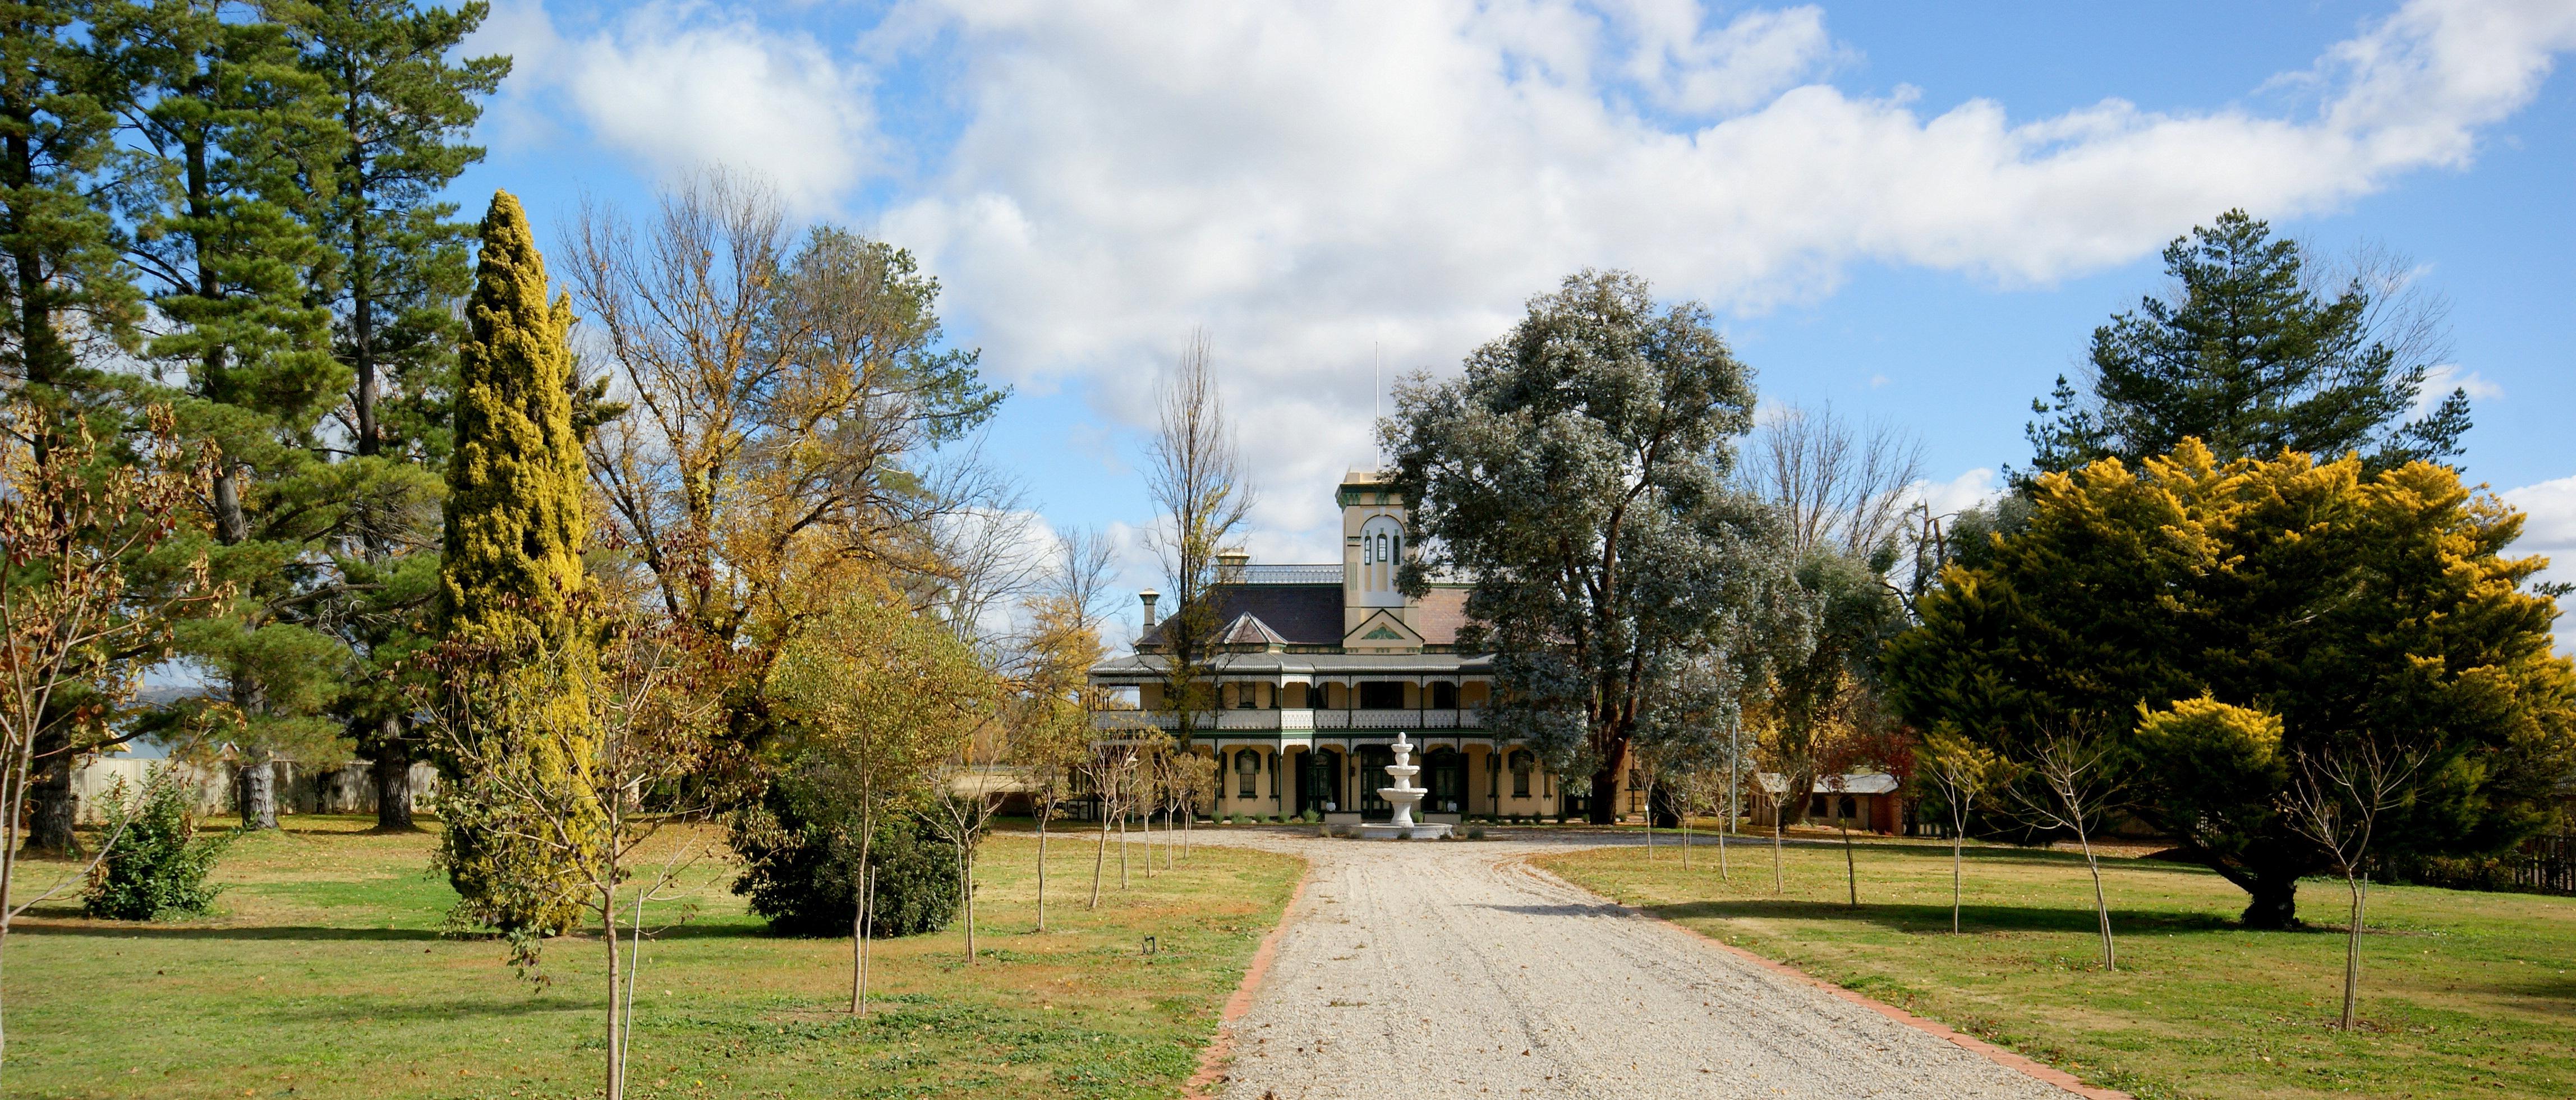 File Woolstone House Bathurst Nsw Australia Jpg